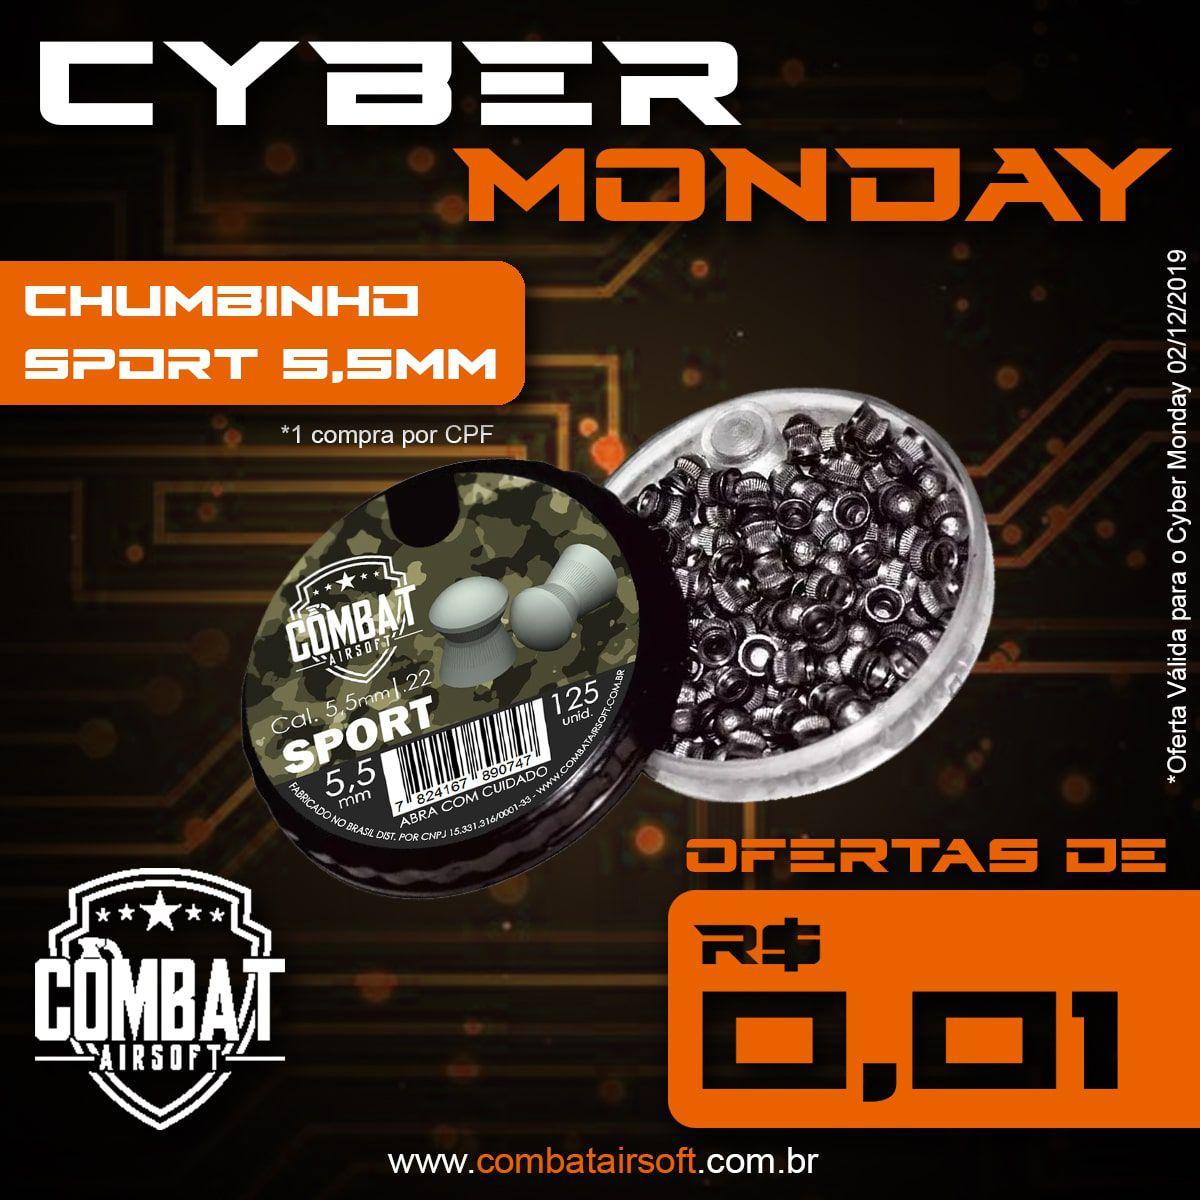 Chumbinho Combat Sport 5,5mm